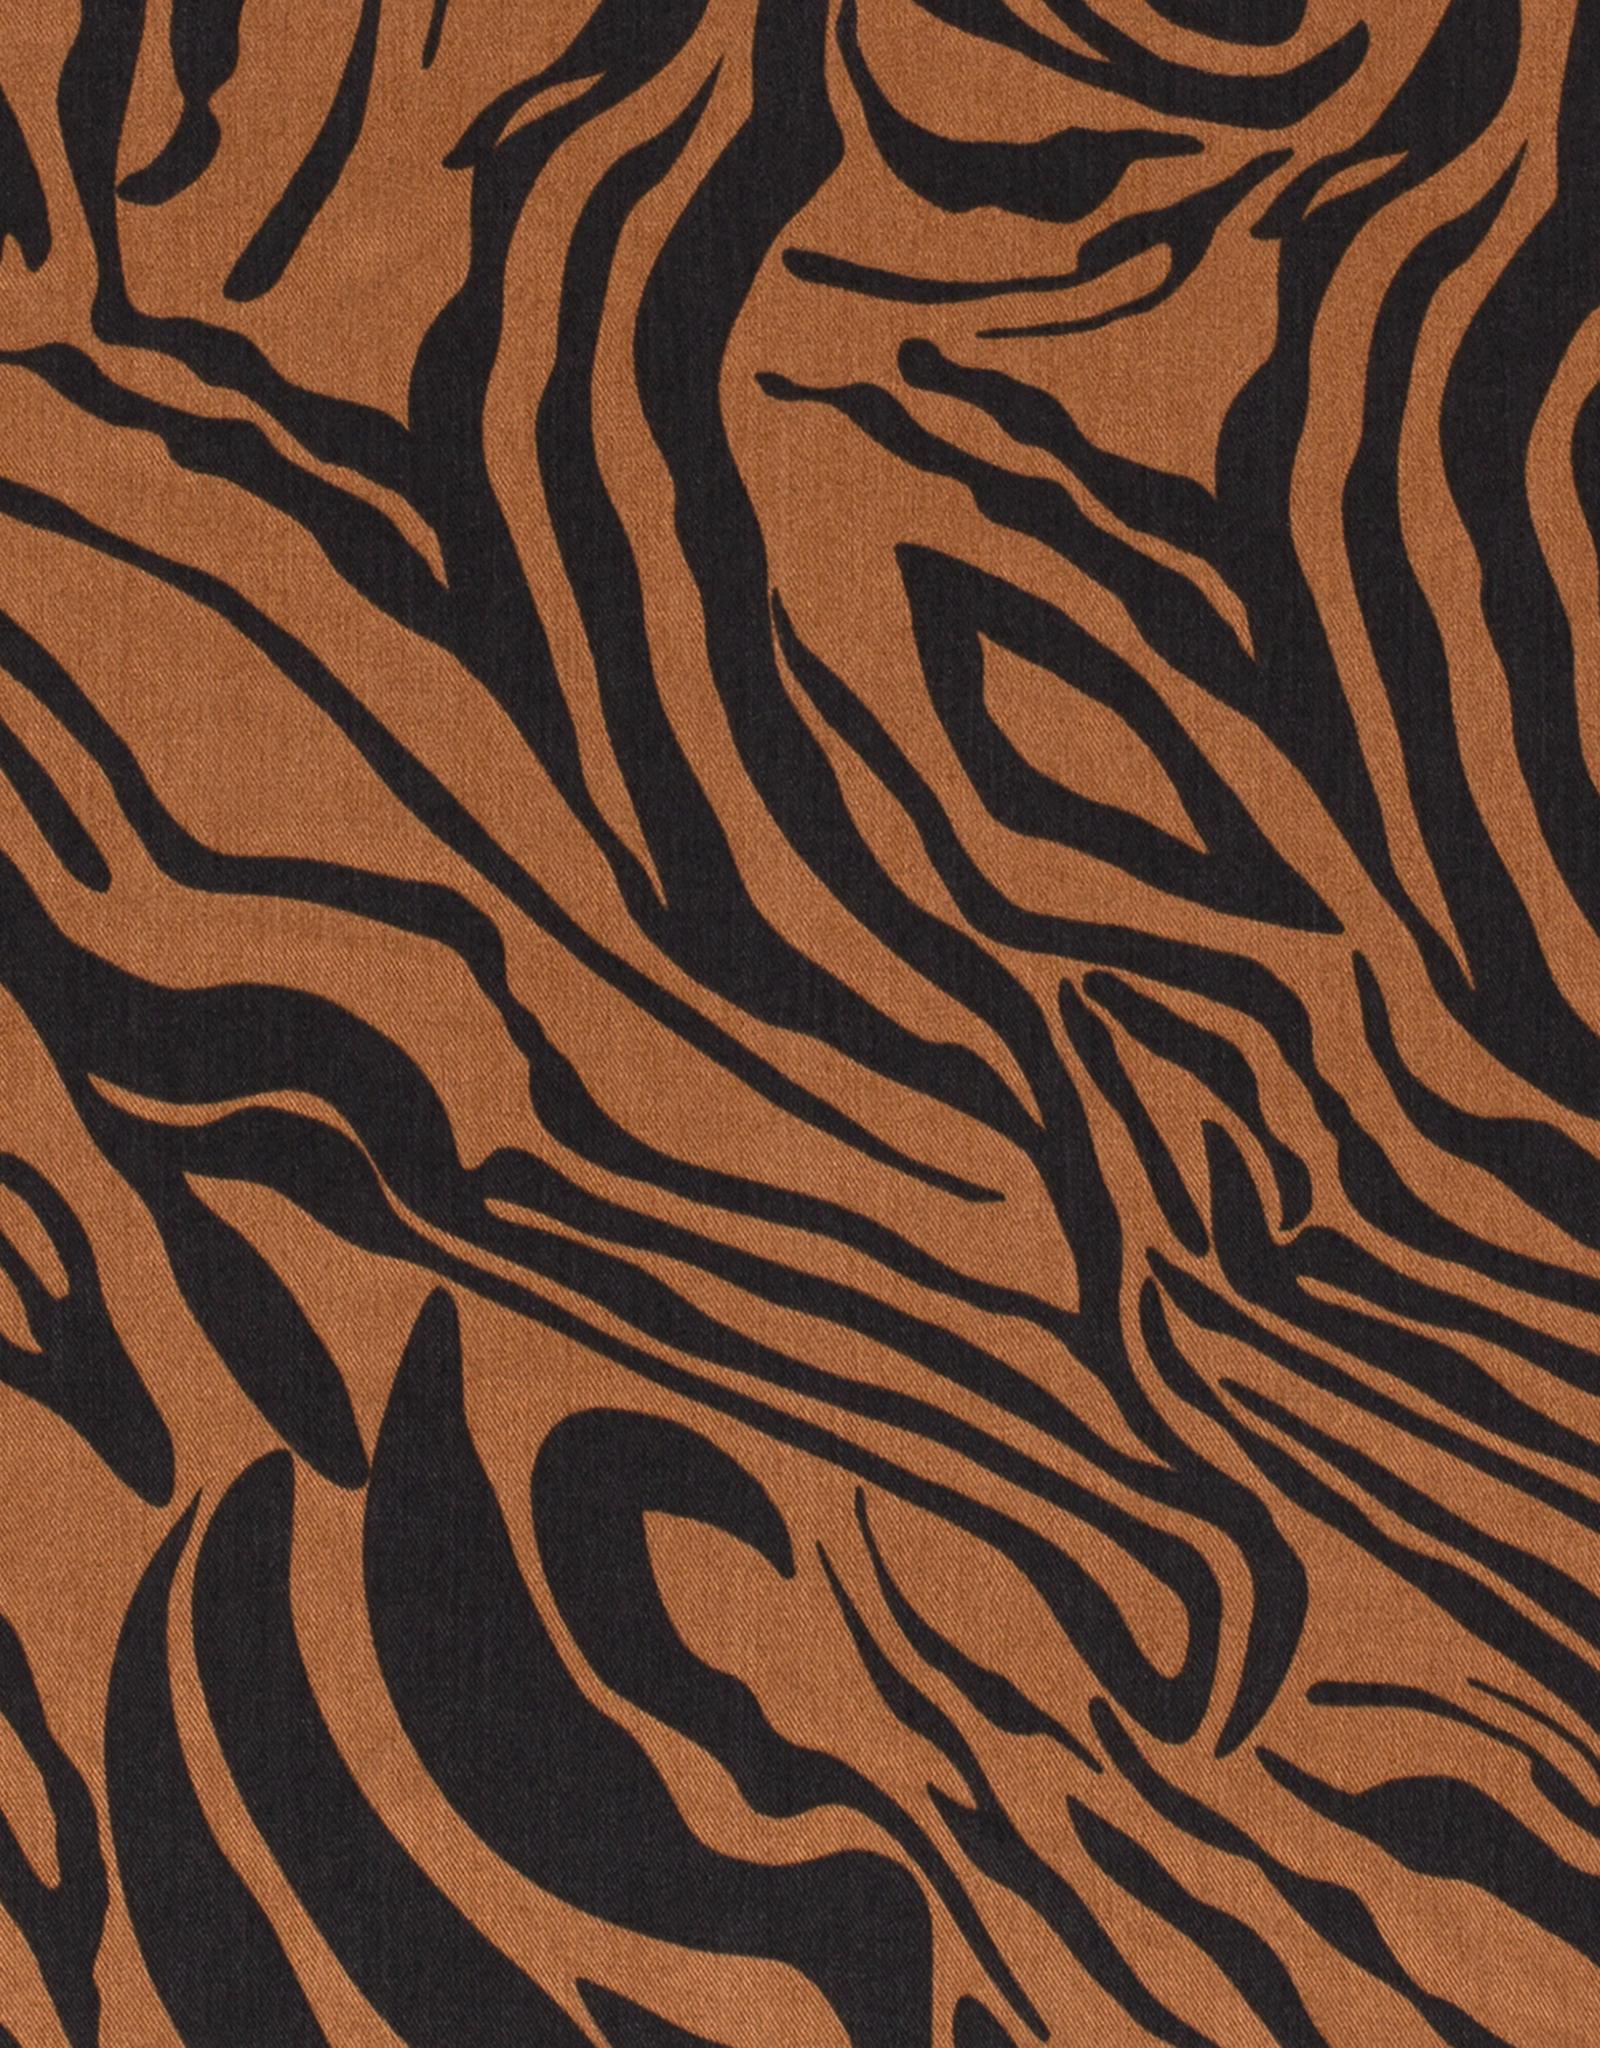 Stik-Stof Tencel zebra taupebruin